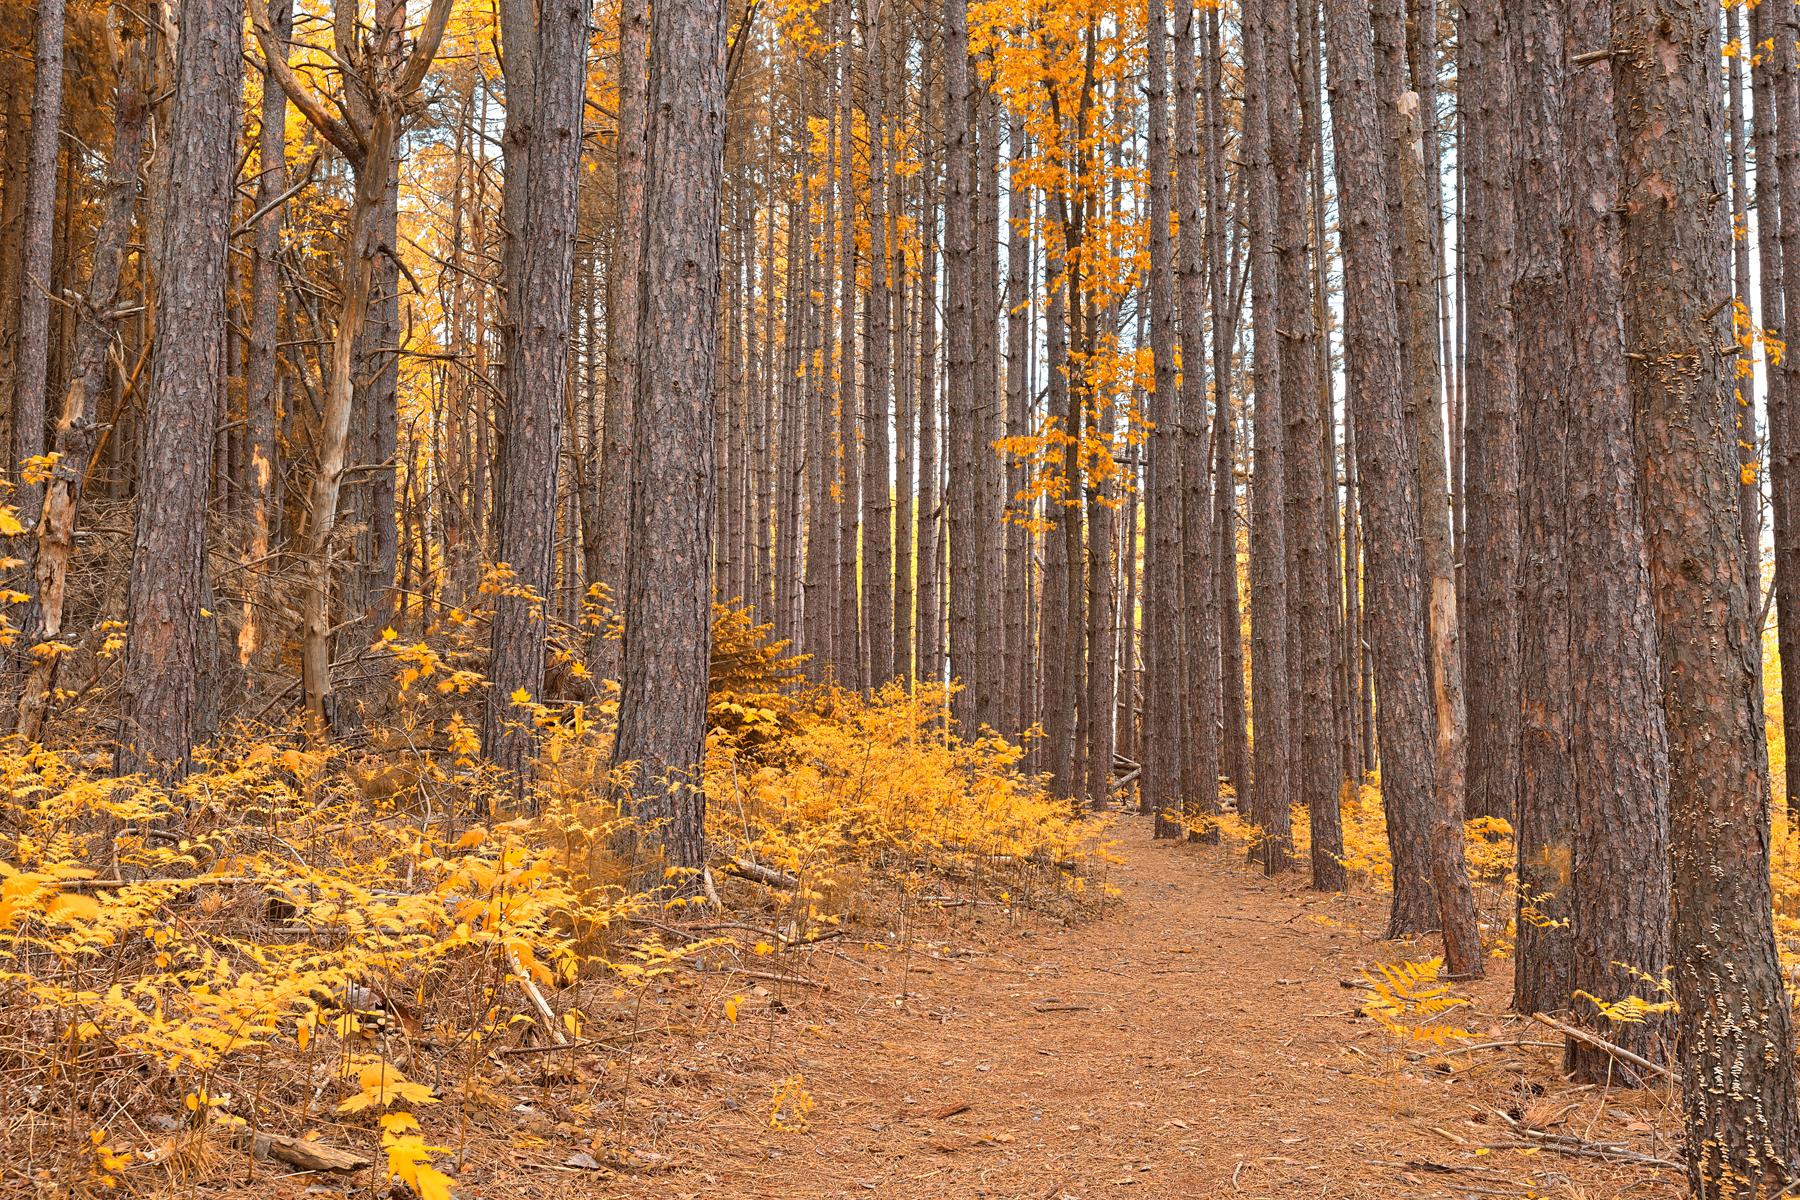 Cranesville swamp pine trail - gold fantasy hdr photo